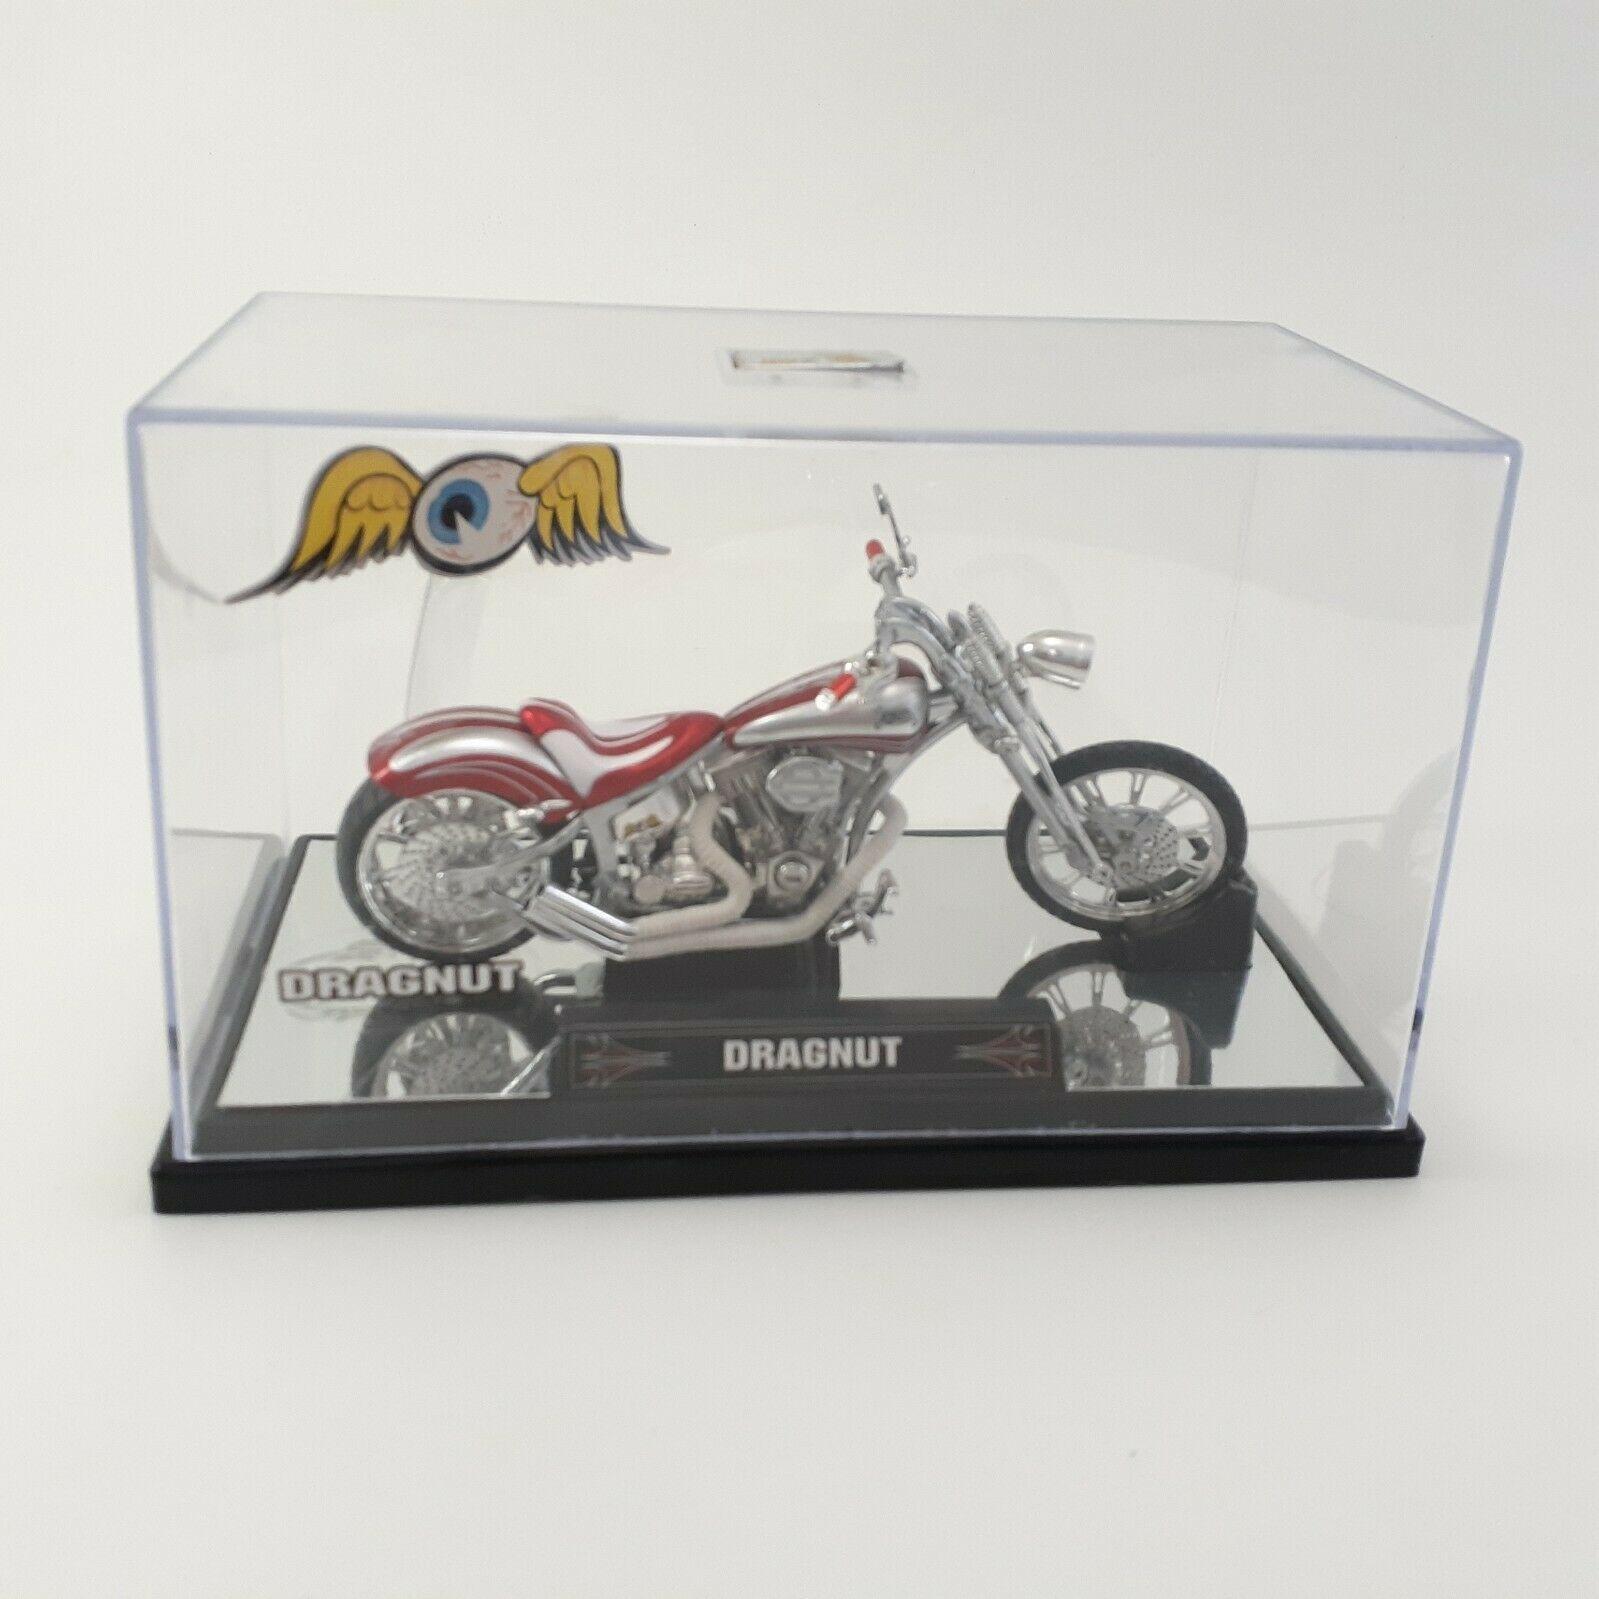 "Von Dutch Kustom (1:18) ""Dragnut"" Red Motorcycle Diecast, by Jada Toys / Loose"